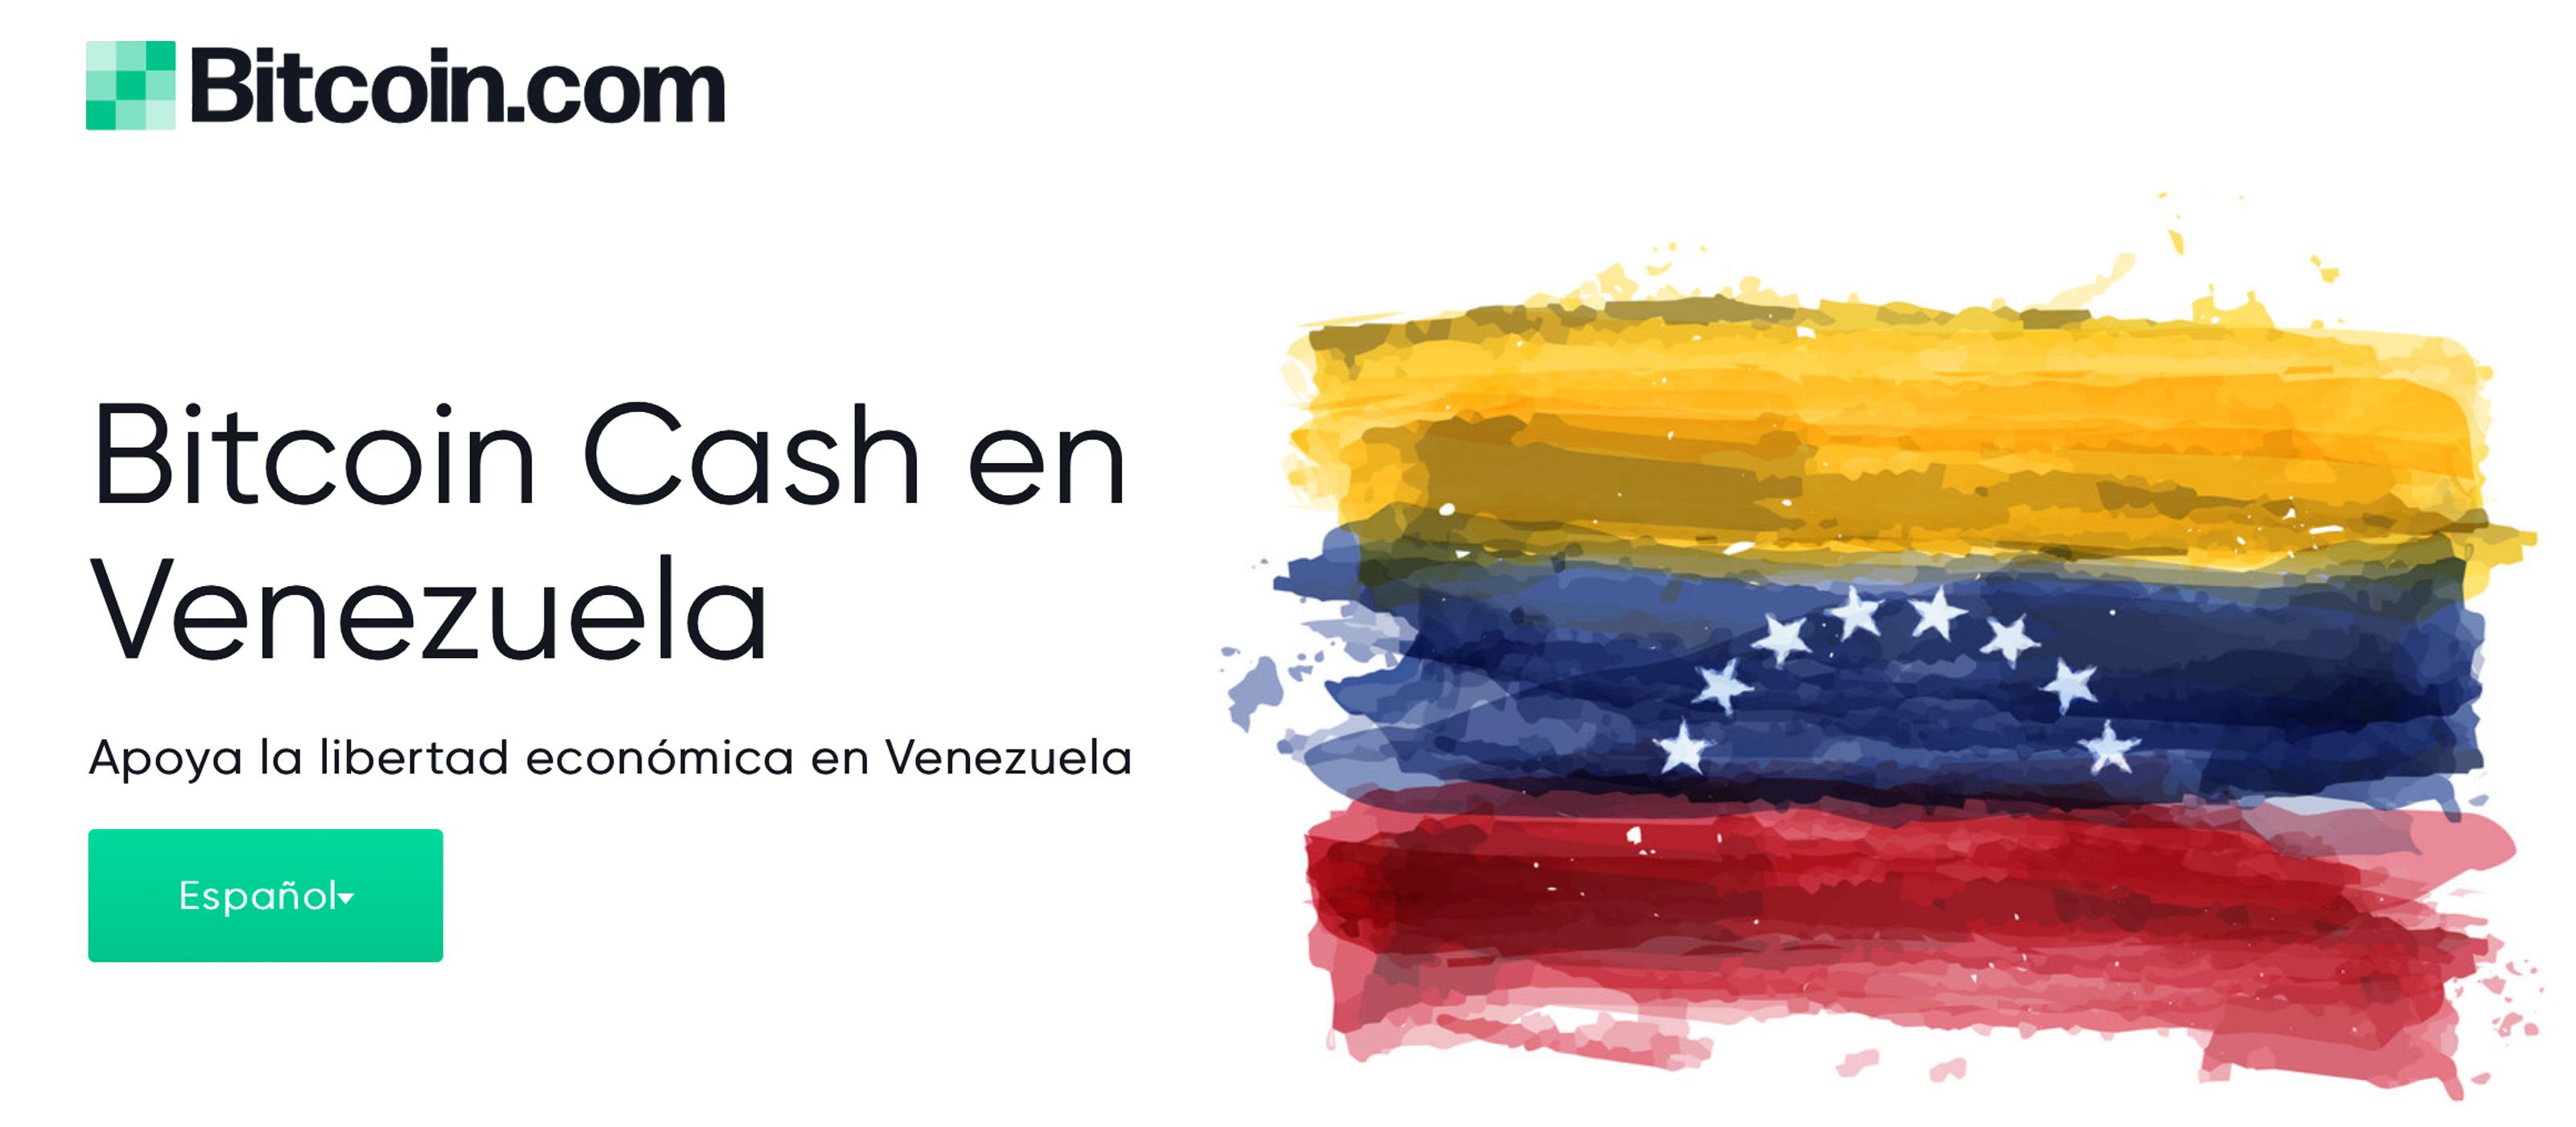 "Más de 200 taxis venezolanos descubren los beneficios de Bitcoin Cash ""width ="" 3200 ""height ="" 1400 ""srcset ="" https://blackswanfinances.com/wp-content/uploads/2019/10/untven.jpg 3200w, https://news.bitcoin.com/wp-content/uploads/2019/10/untven-300x131.jpg 300w, https://news.bitcoin.com/wp-content/uploads/2019/10/untven-768x336.jpg 768w, https://news.bitcoin.com/wp-content/uploads/2019/10/untven -1024x448.jpg 1024w, https://news.bitcoin.com/wp-content/uploads/2019/10/untven-696x305.jpg 696w, https://news.bitcoin.com/wp-content/uploads/2019 /10/untven-1392x609.jpg 1392w, https://news.bitcoin.com/wp-content/uploads/2019/10/untven-1068x467.jpg 1068w, https://news.bitcoin.com/wp-content/uploads/2019/10/untven-960x420.jpg 960w ""tamaños ="" (ancho máximo: 3200px) 100vw, 3200px"